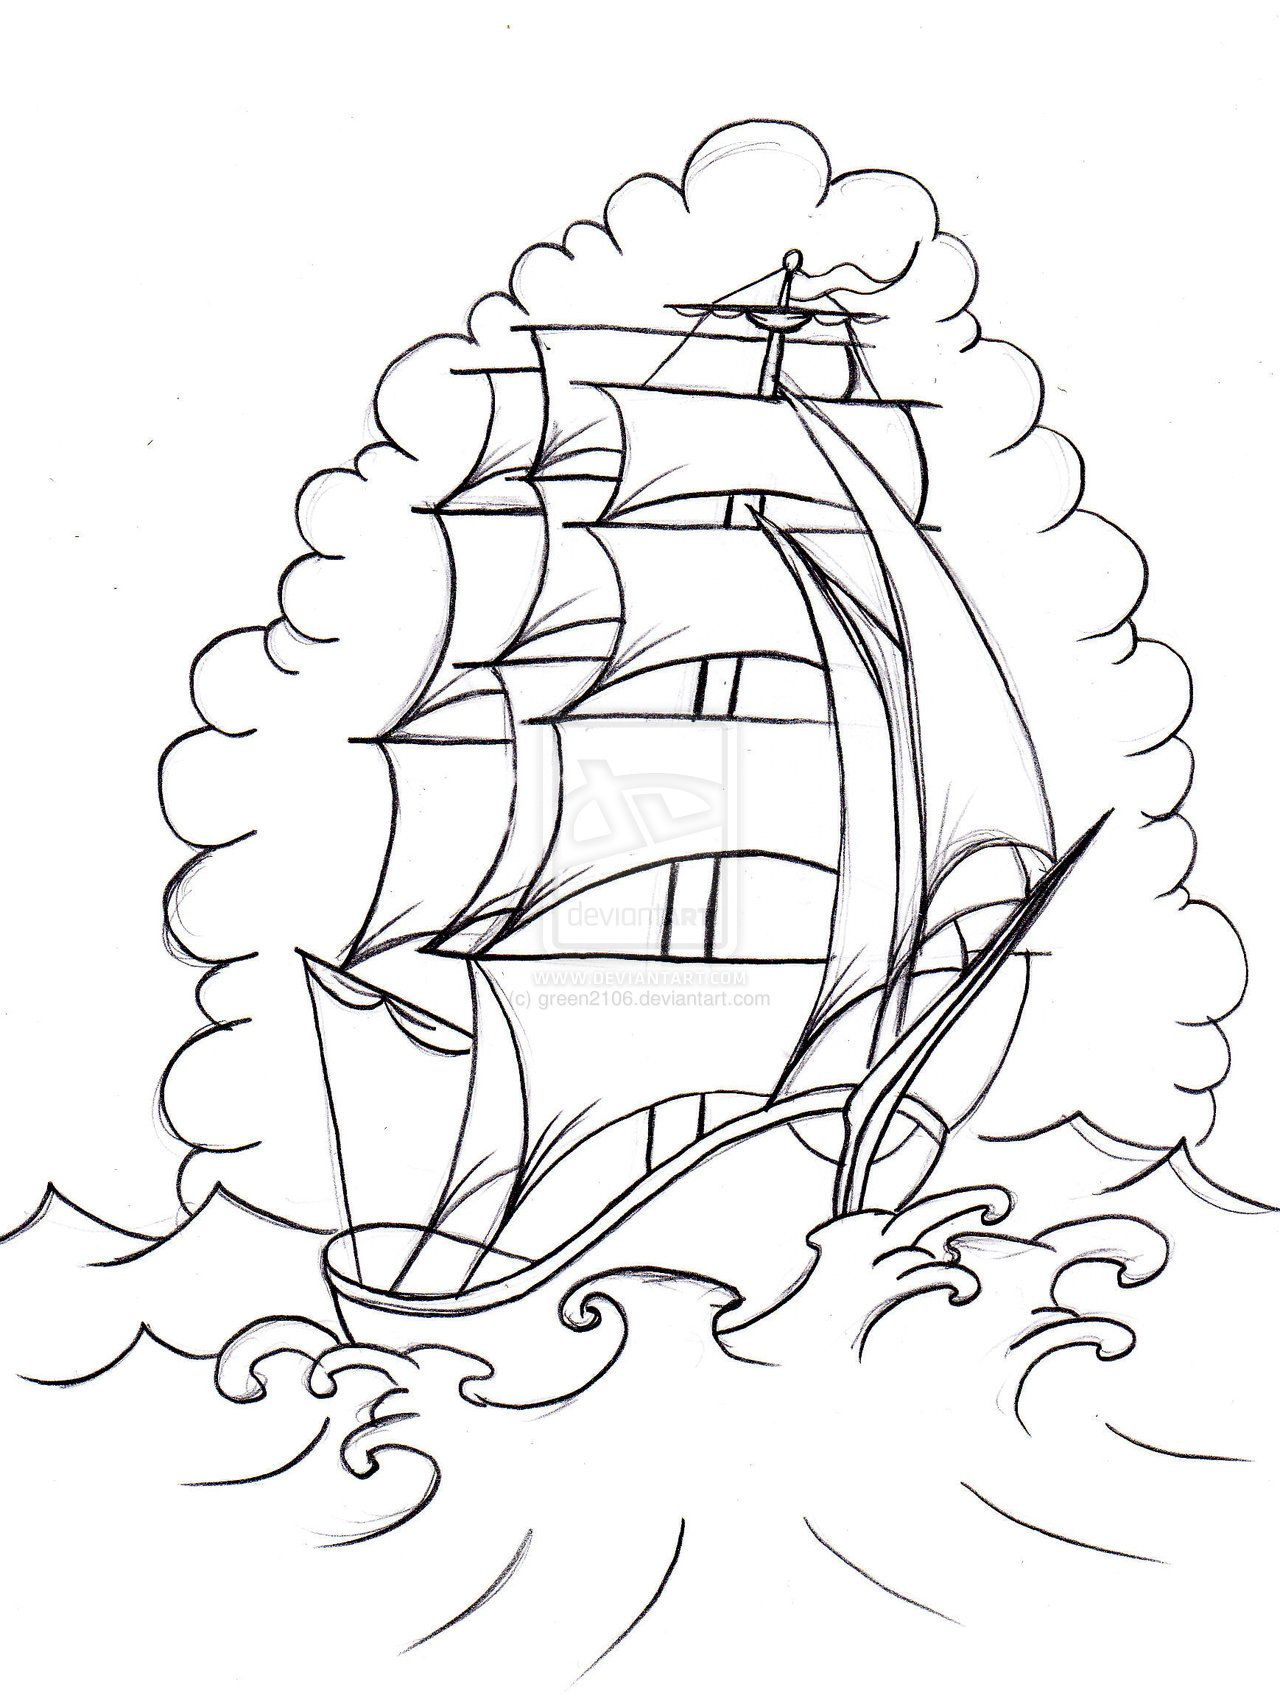 old school boat 2 by green2106 deviantart com on